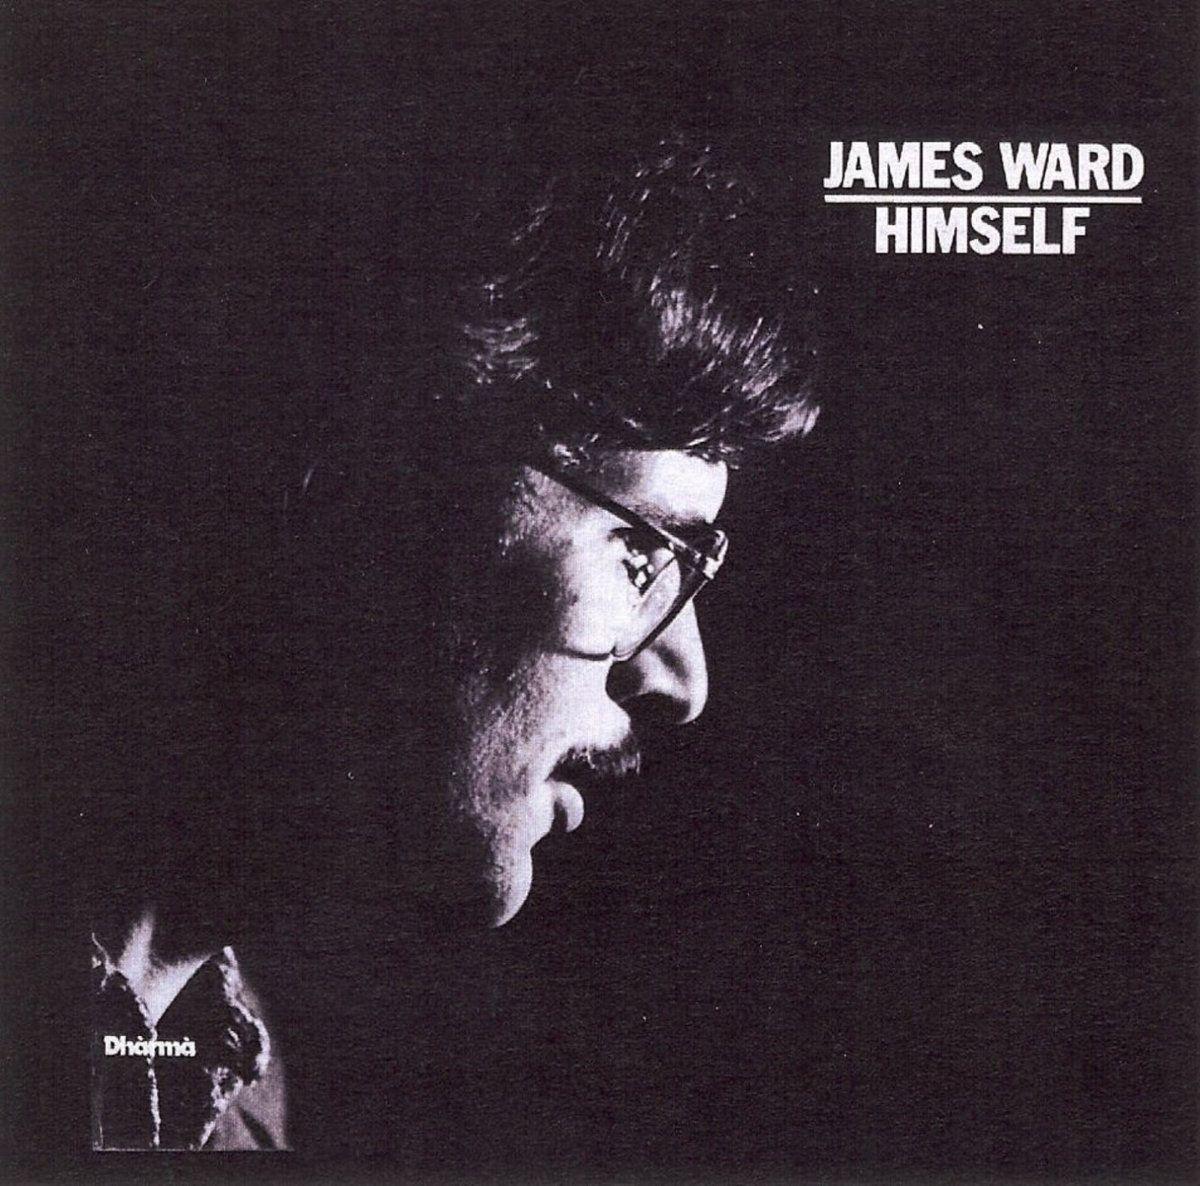 James Ward: Himself